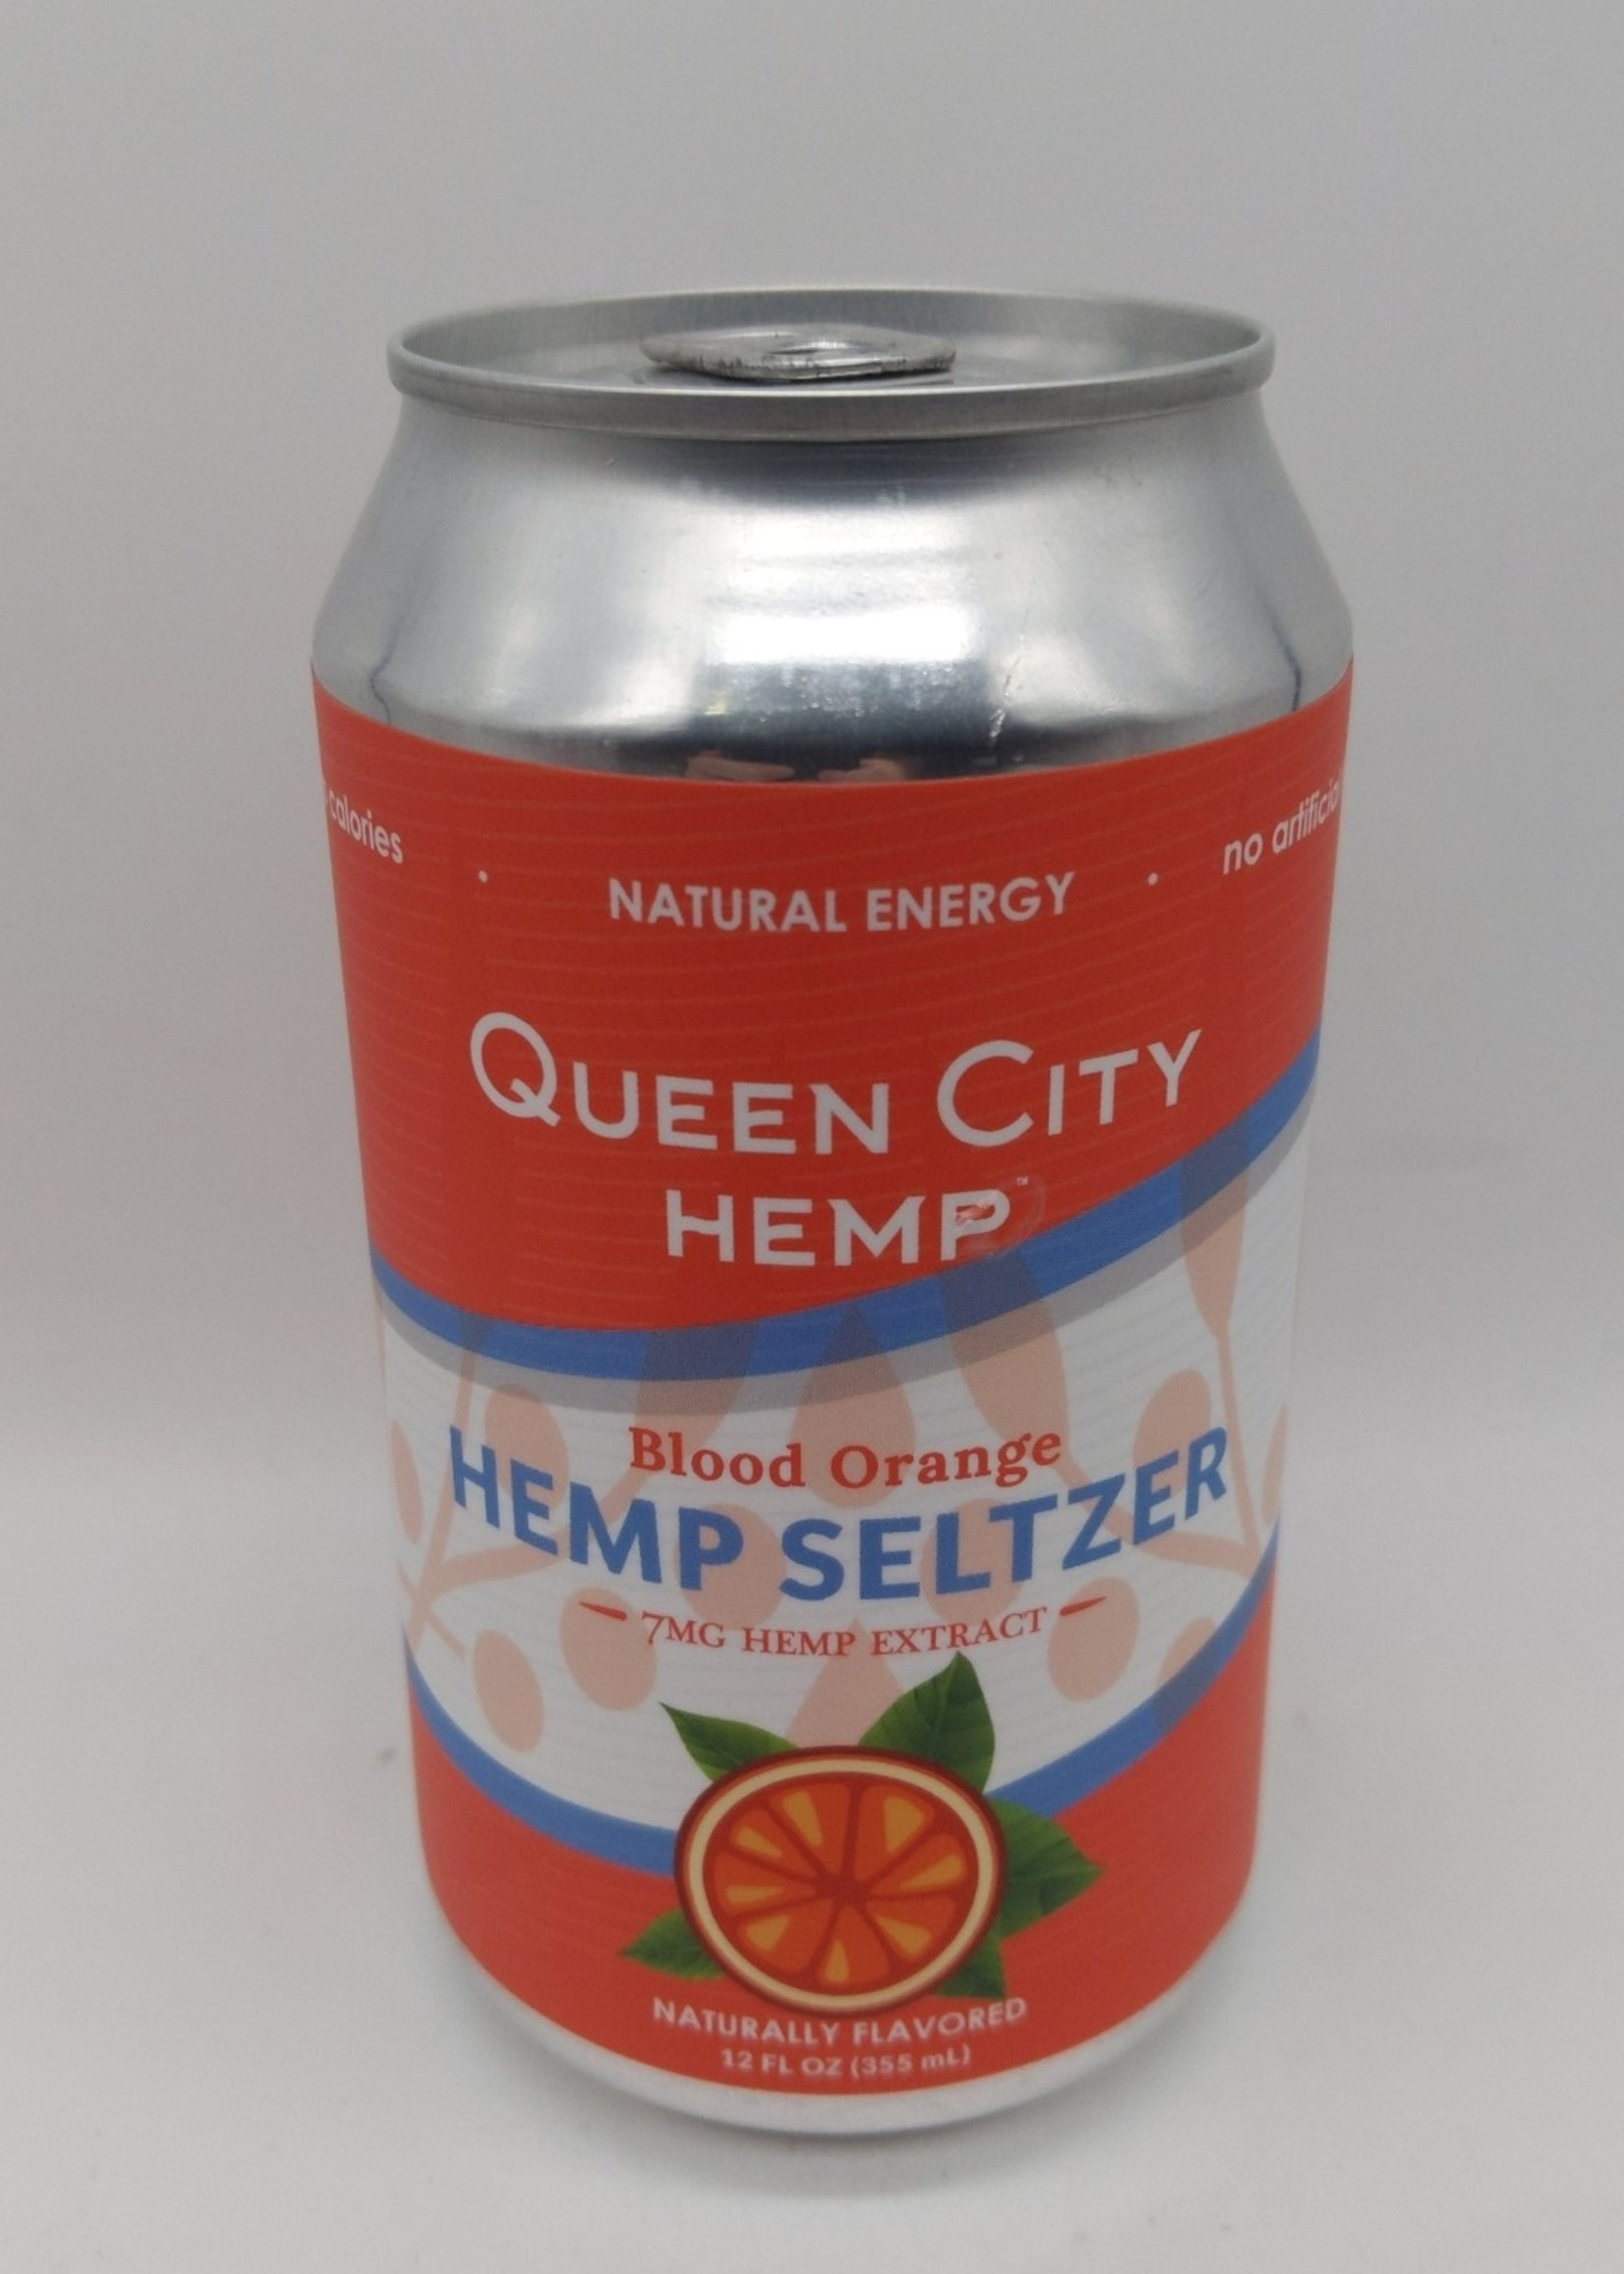 QUEEN CITY HEMP SELTZER BLOOD ORANGE 12 oz